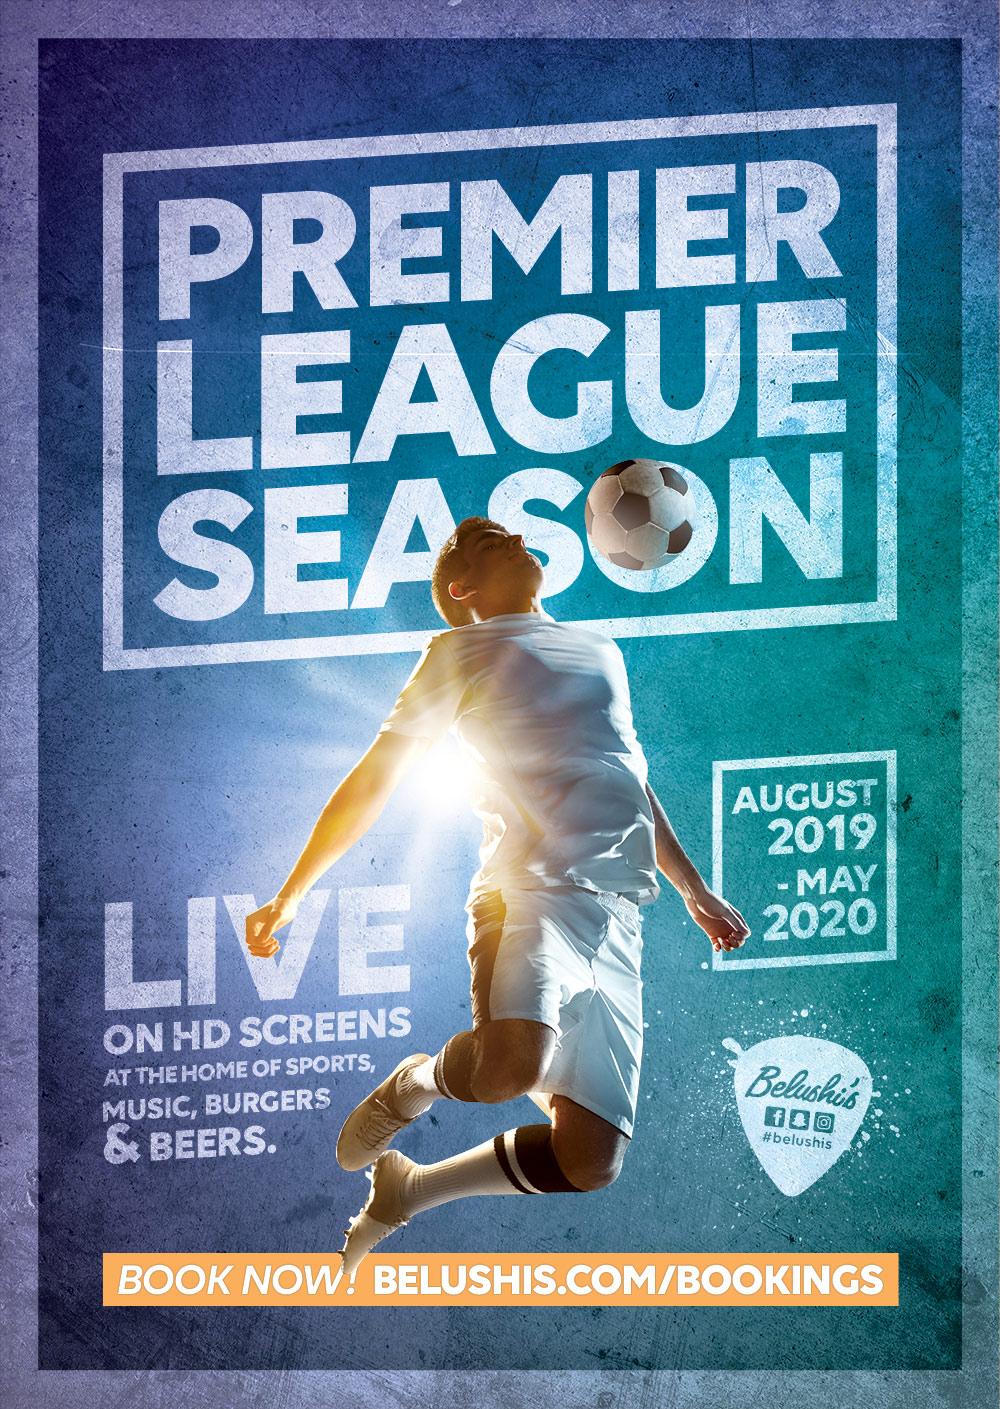 Premier League season in Amsterdam at Belushi's Bar